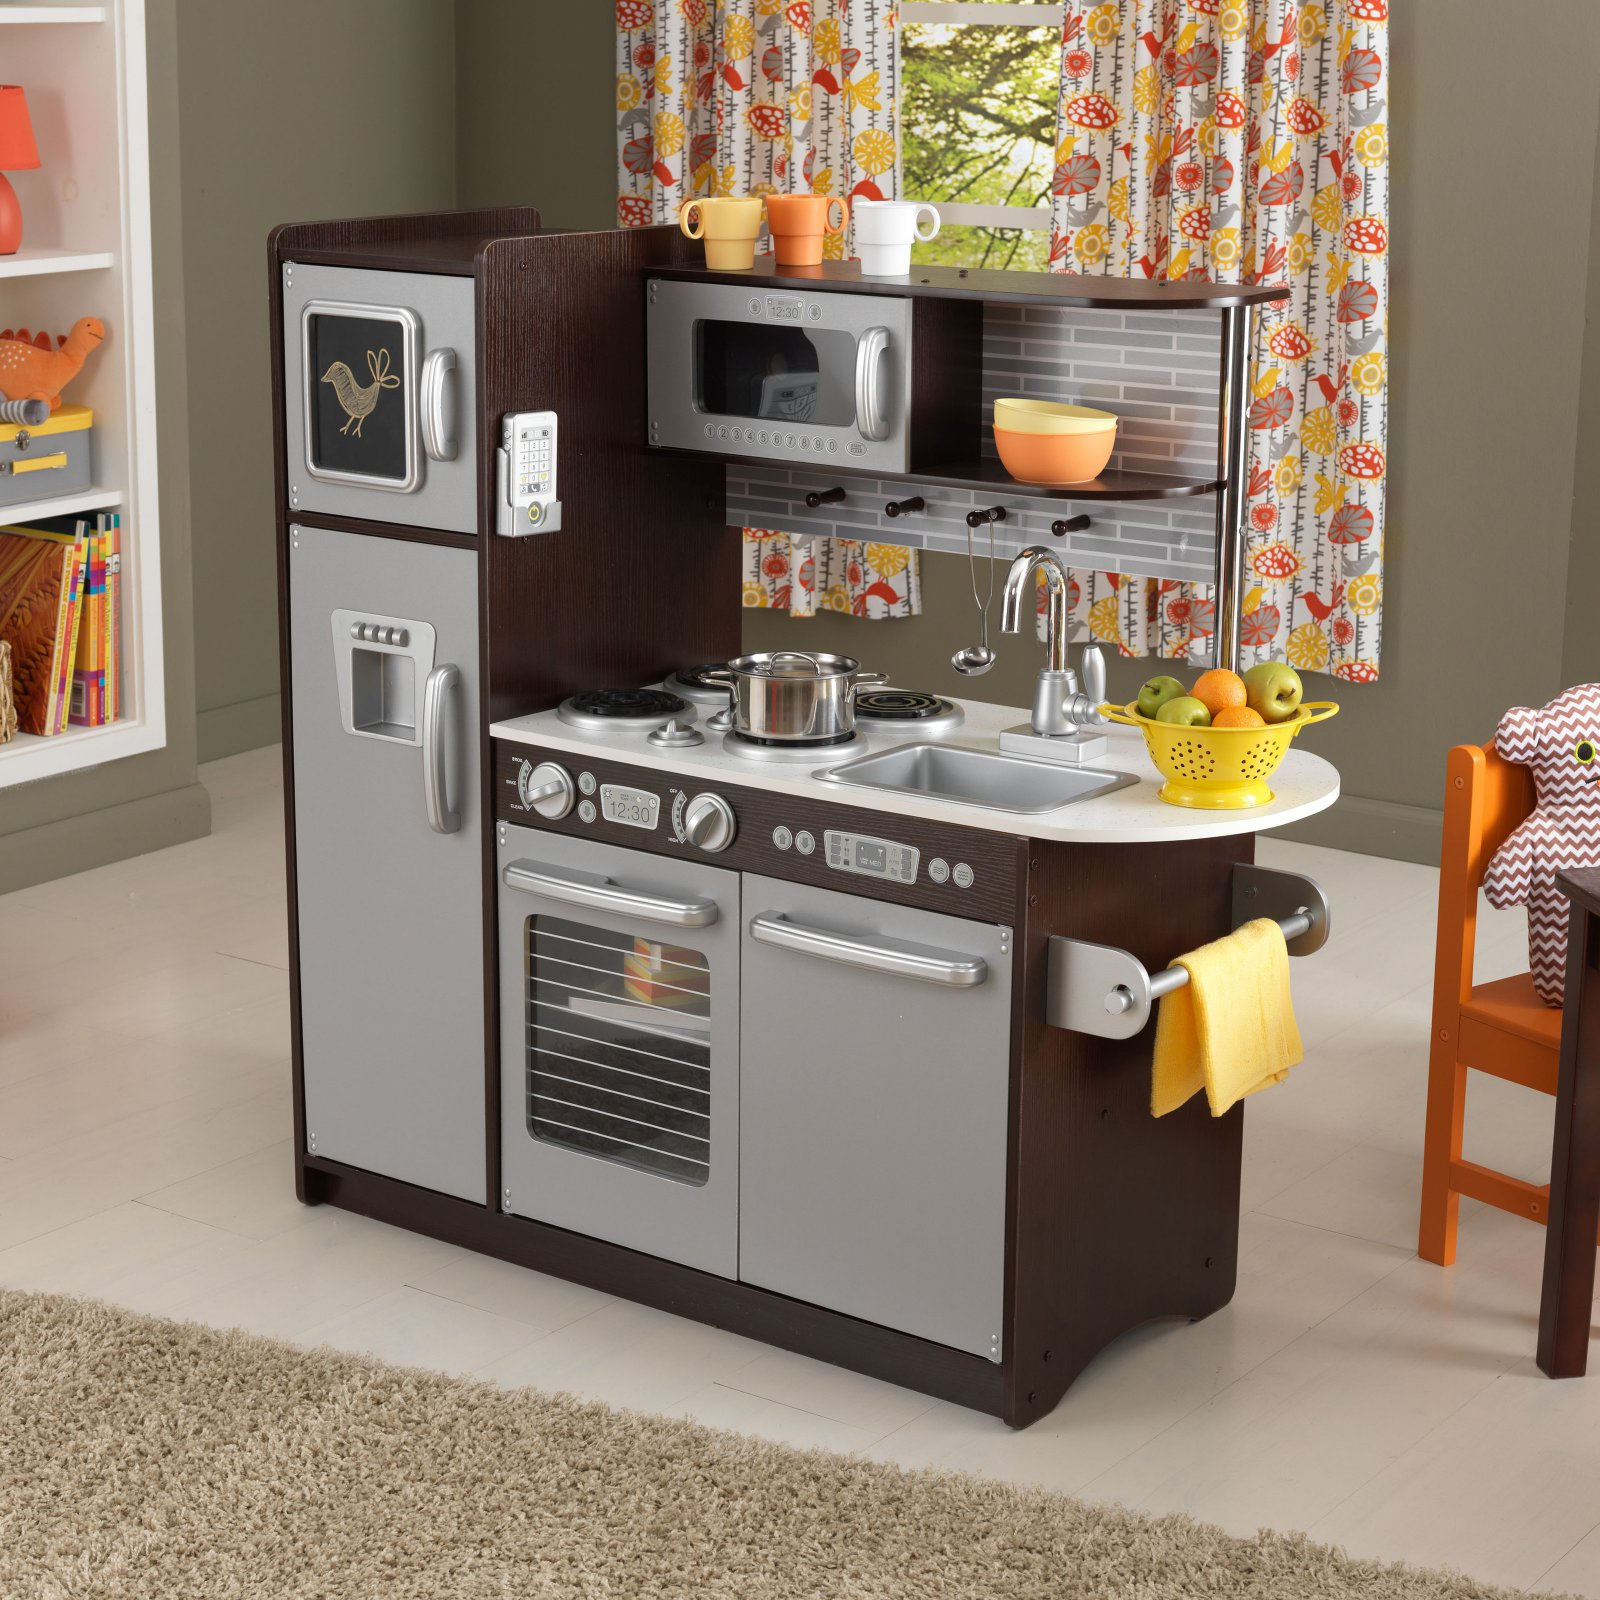 KidKraft Uptown Espresso Play Kitchen  53260  Walmartcom